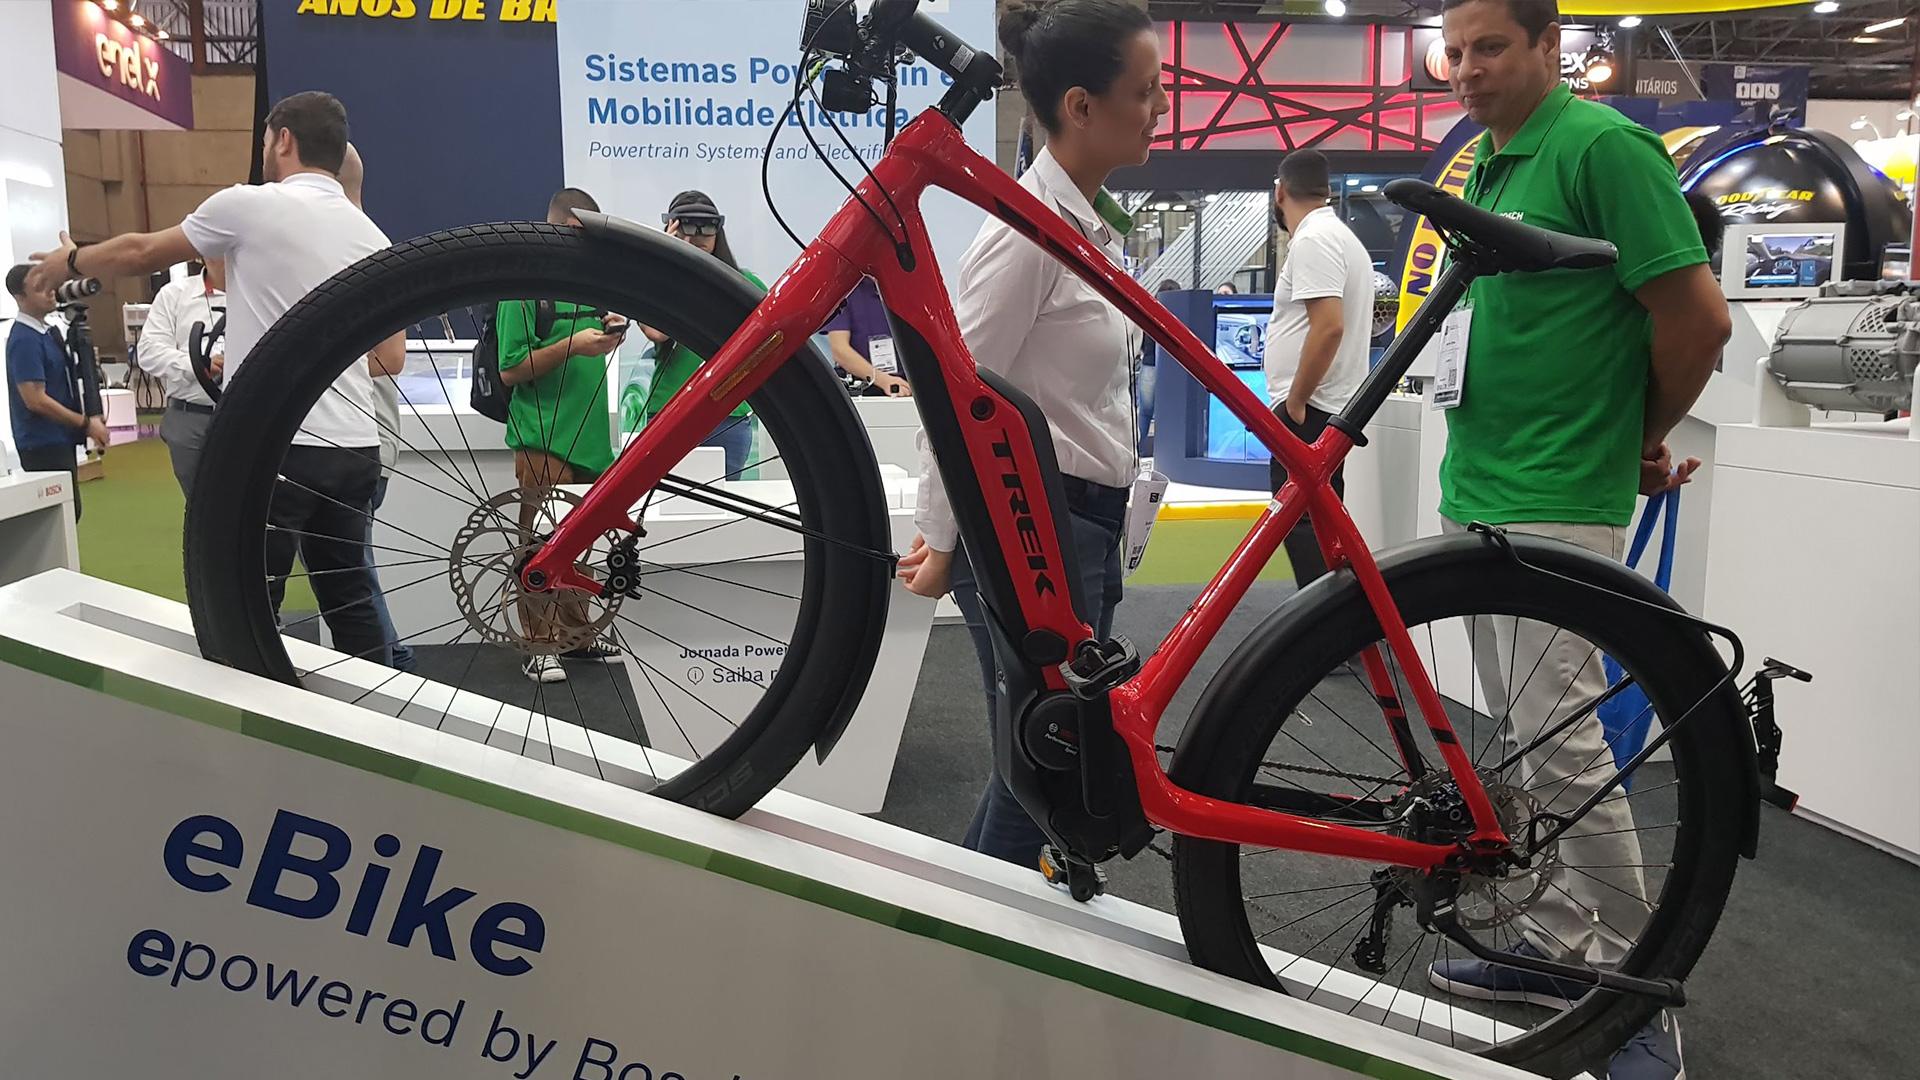 Bike Powered by Bosch